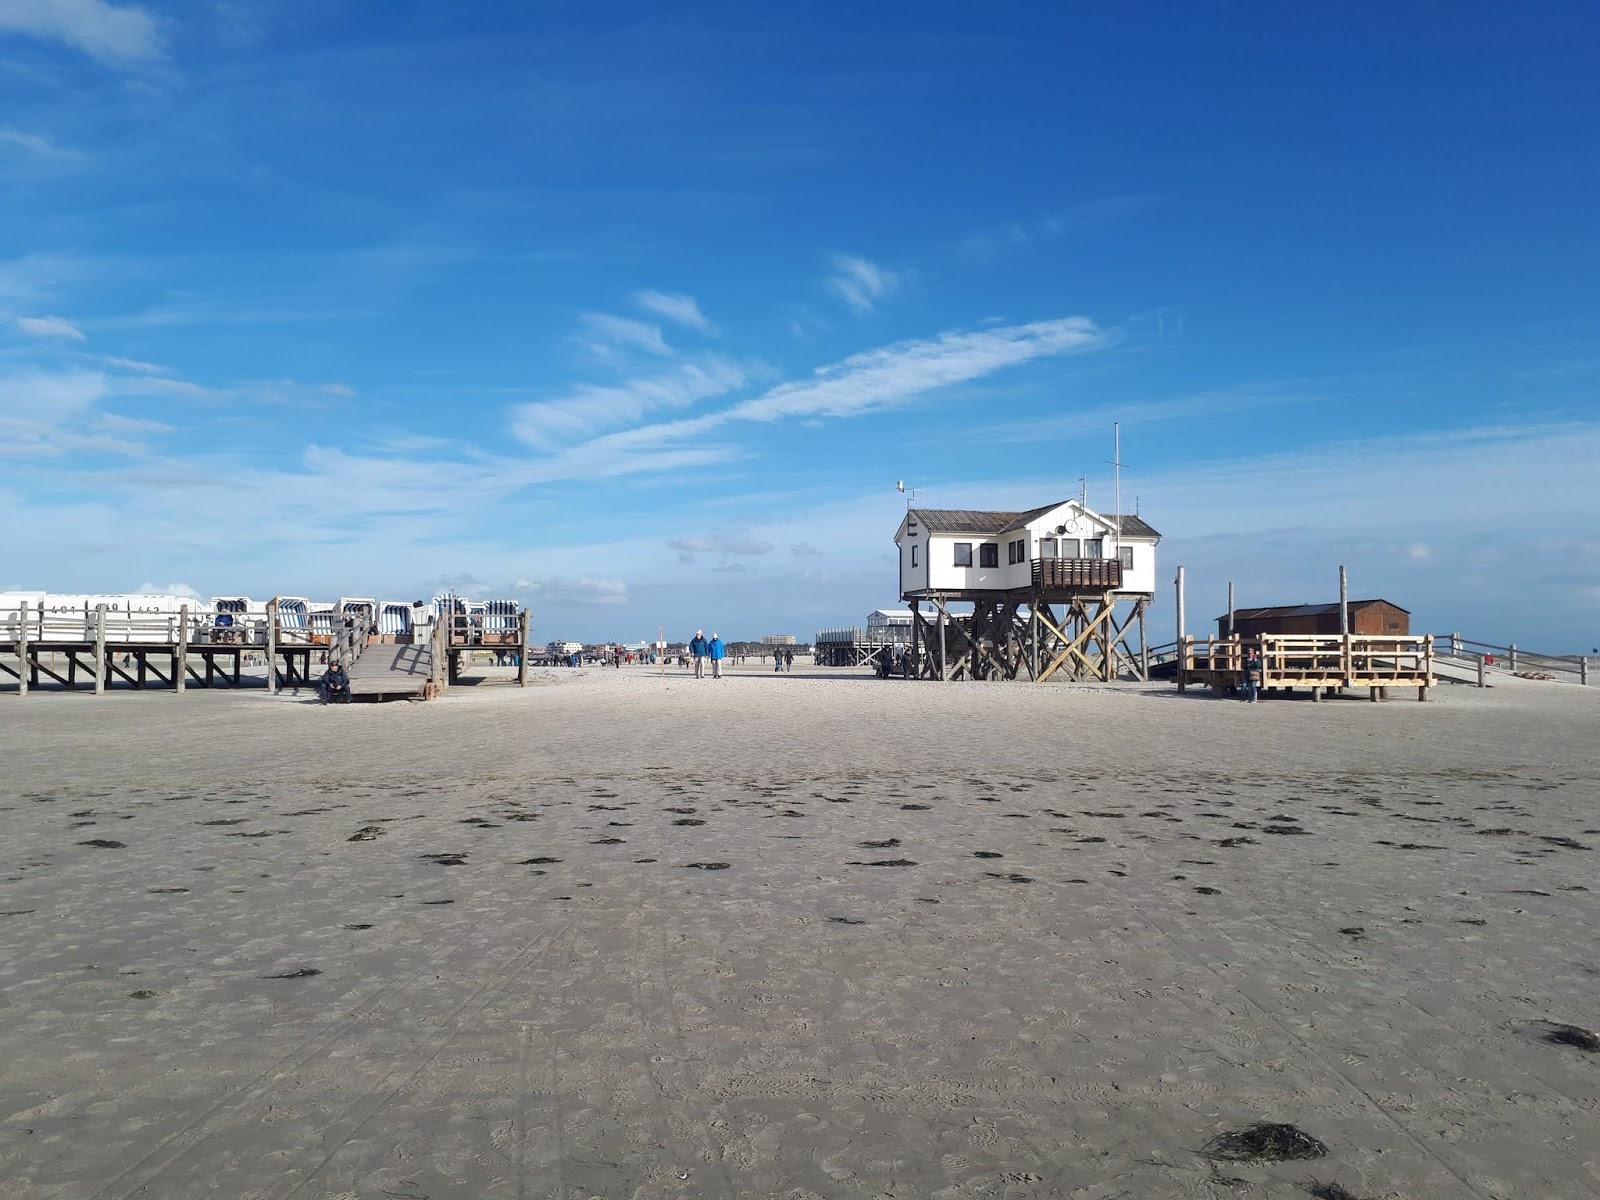 Deichkind Spo Strandgut Resort Tagungshotel In St Peter Ording Aloom